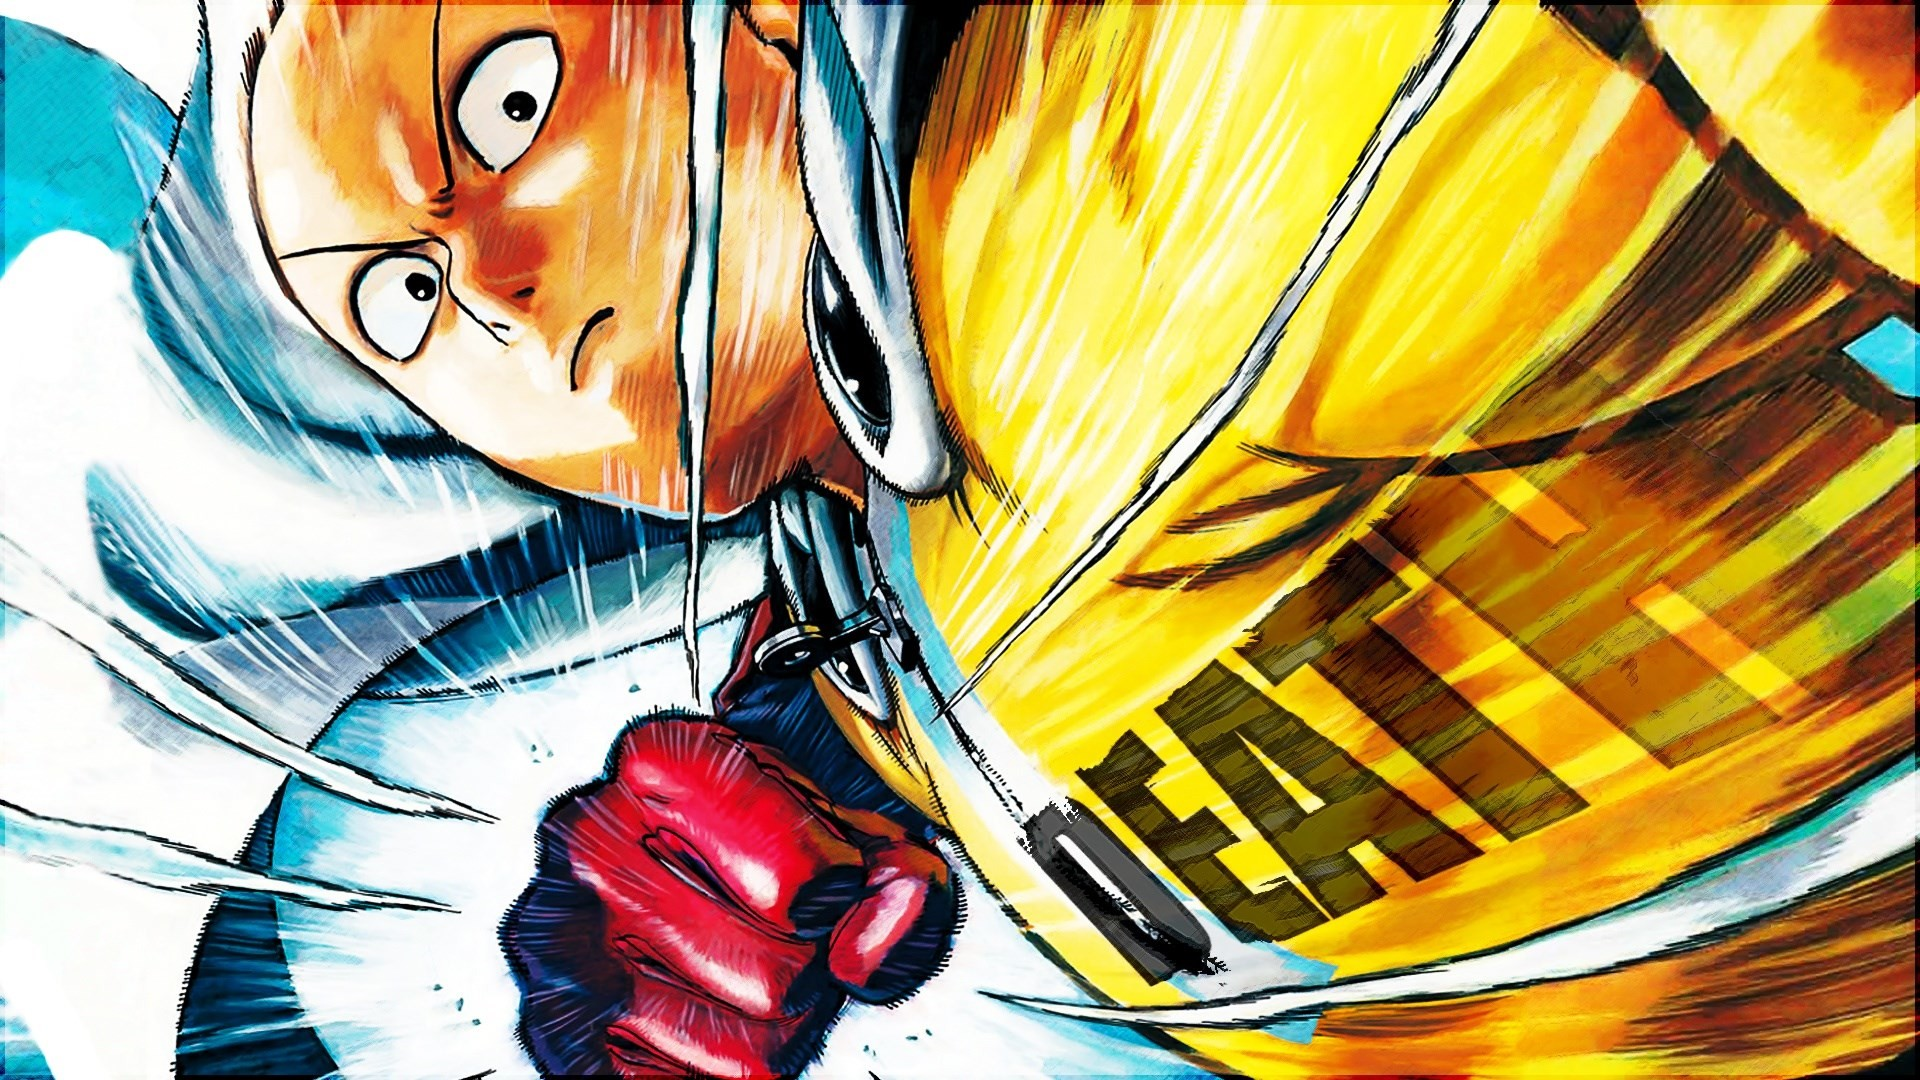 wallpaper images one punch man (Brooke Edwards 1920×1080)